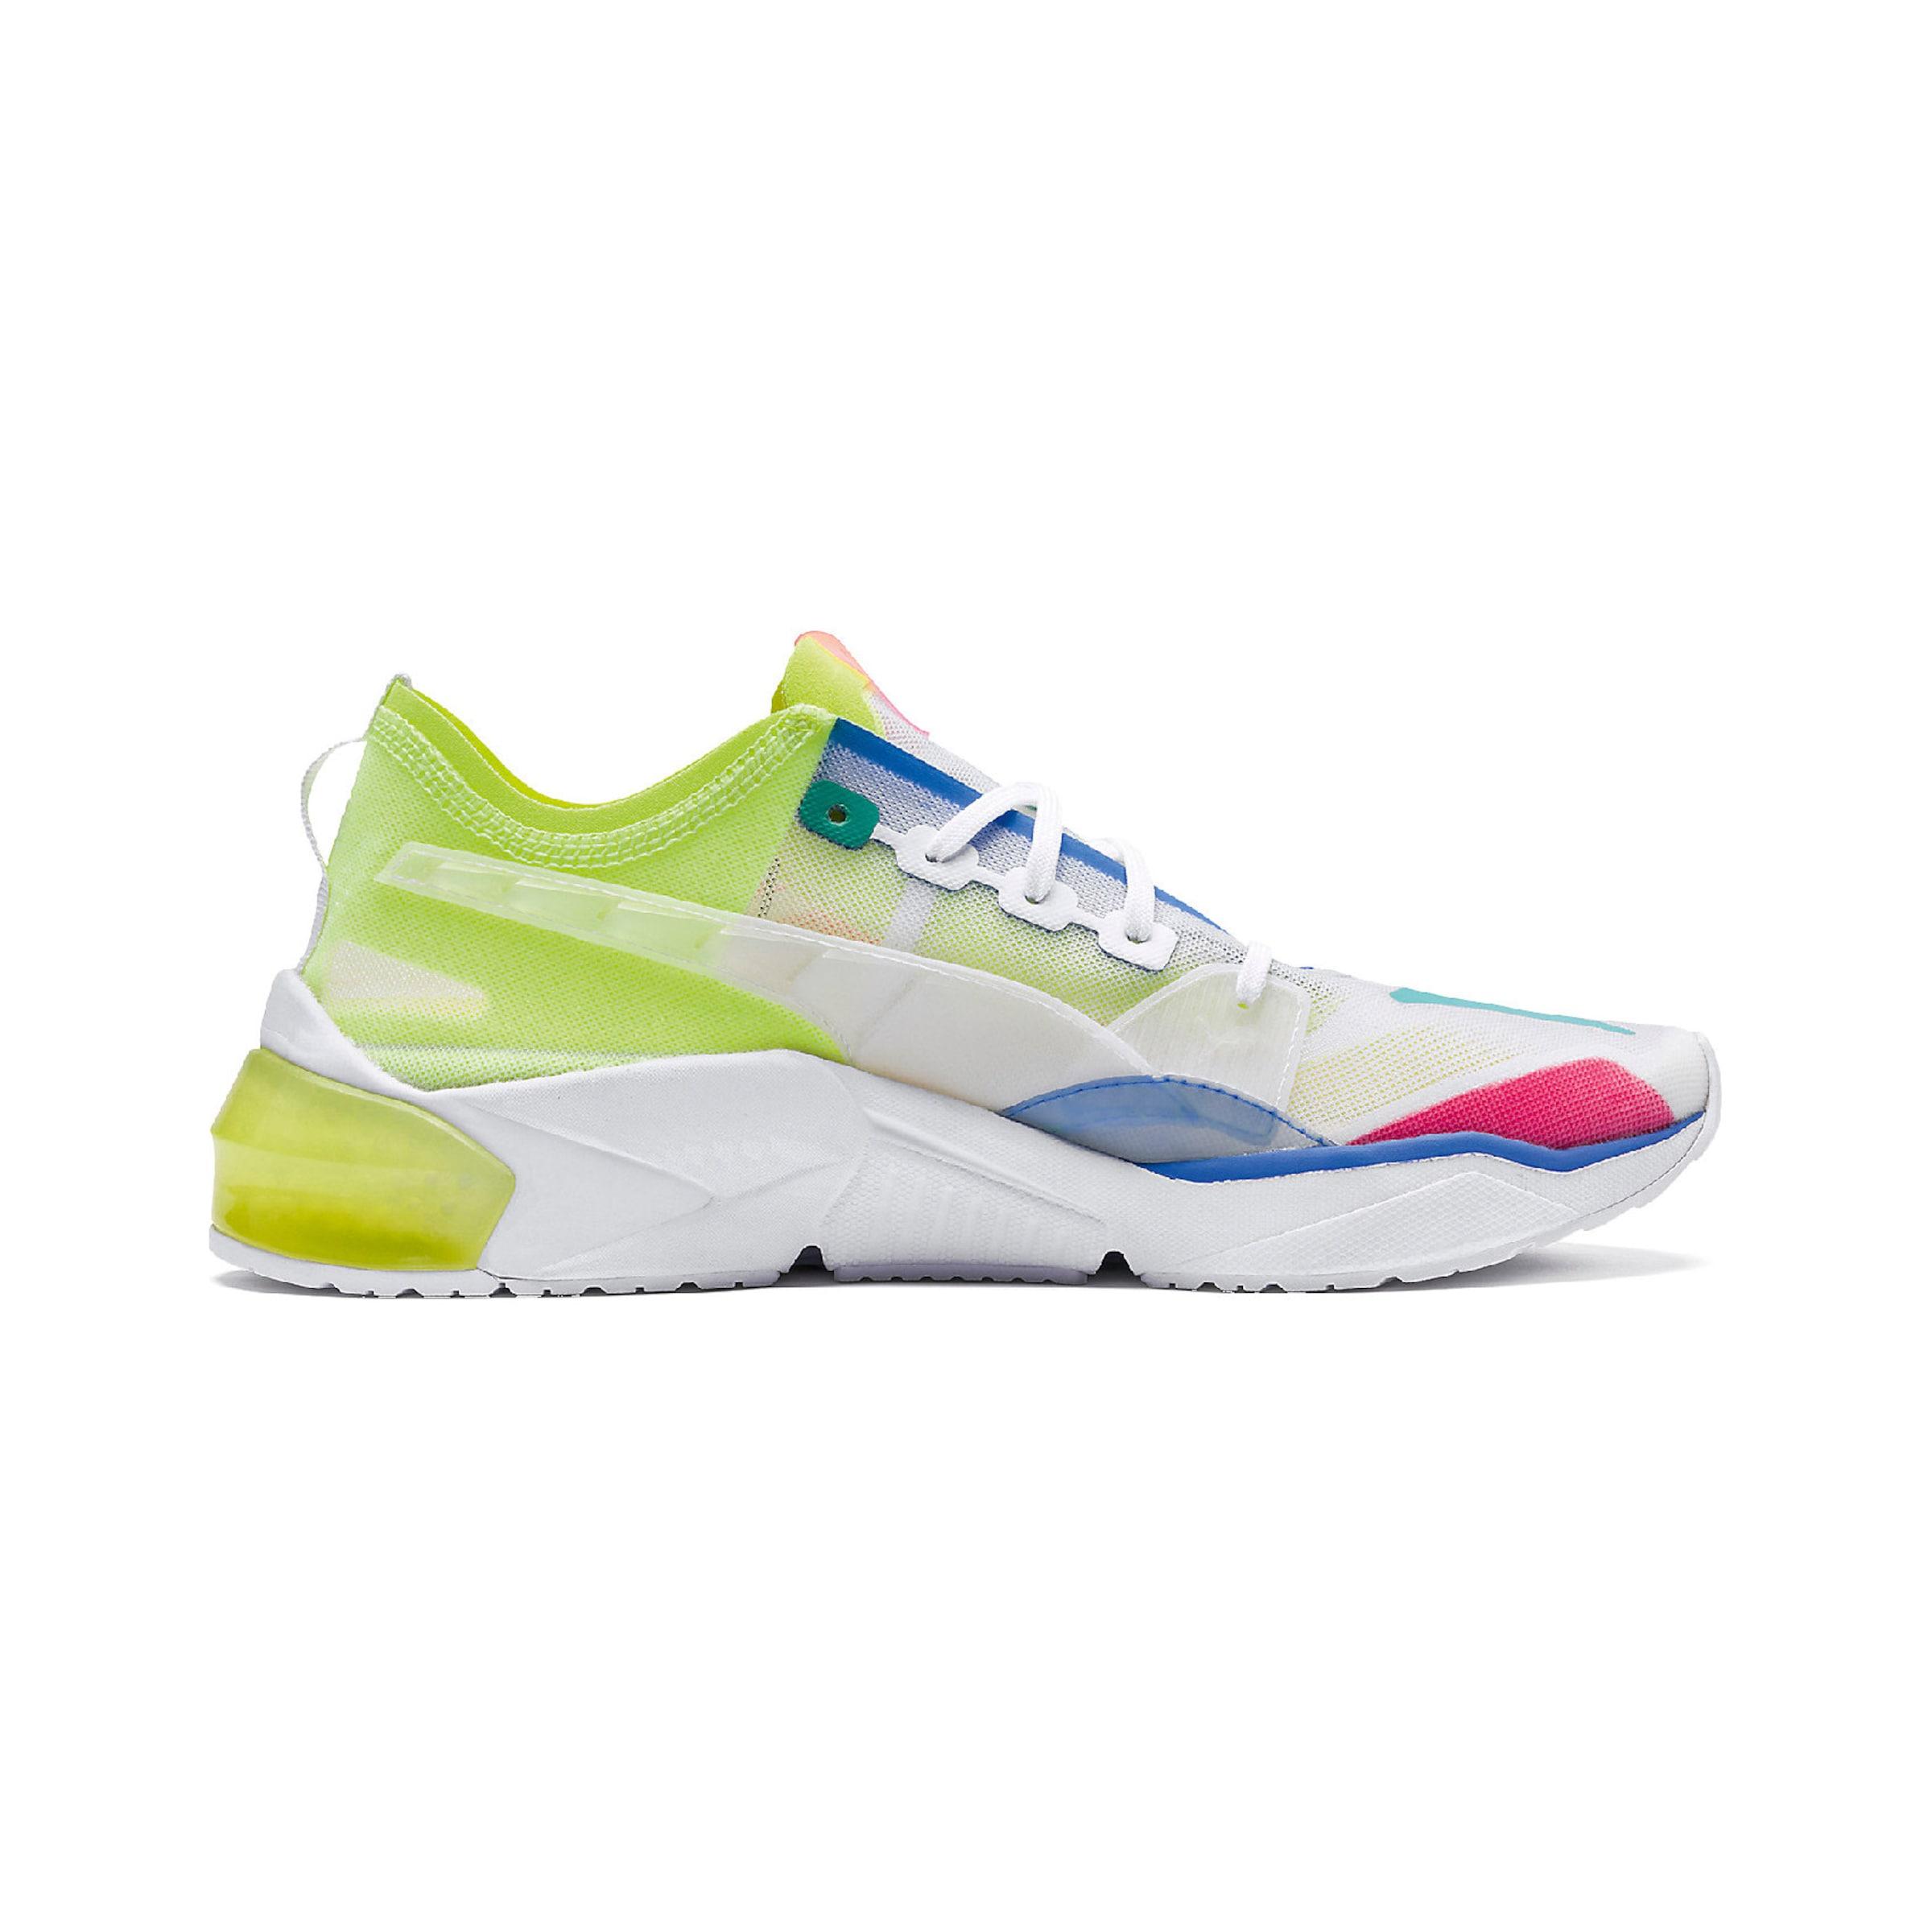 Puma Sneaker Sheer' MischfarbenWeiß In Optic 'lqdcell DH9eW2bEYI